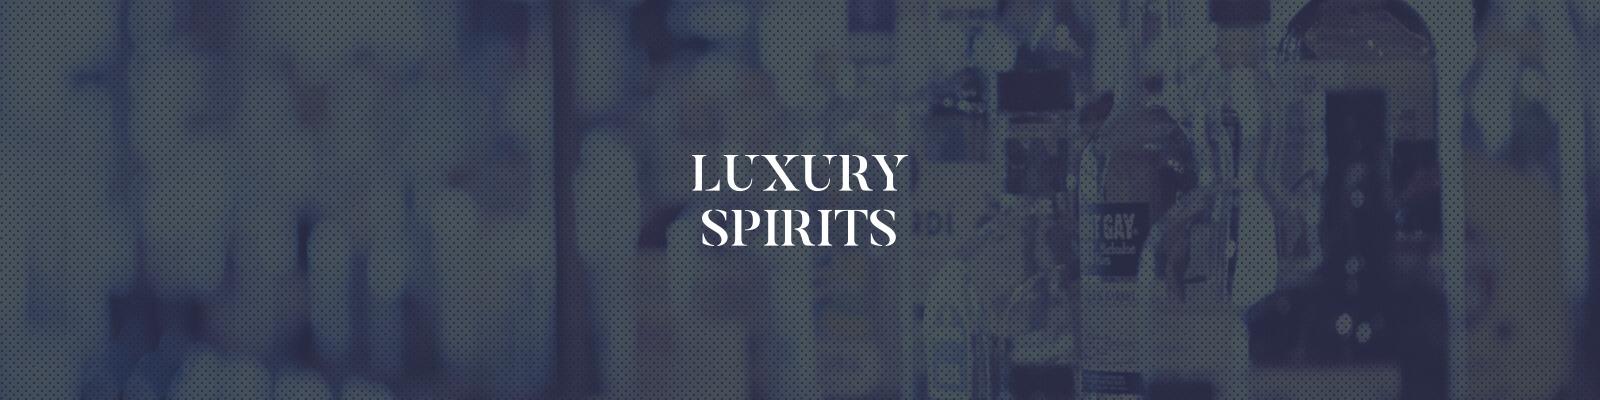 Luxury Spirits